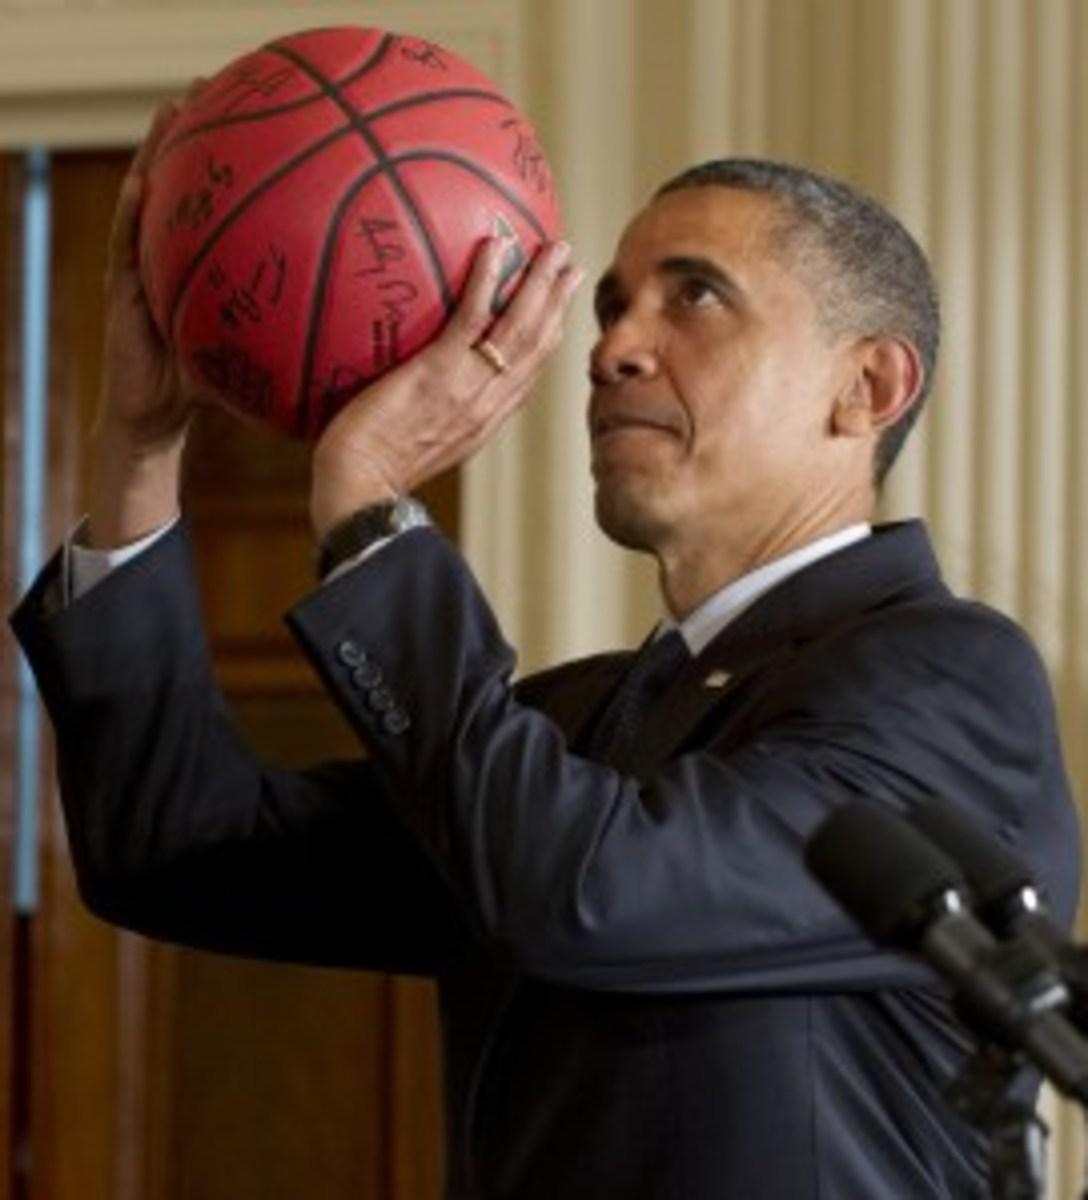 US President Barack Obama pretends to sh